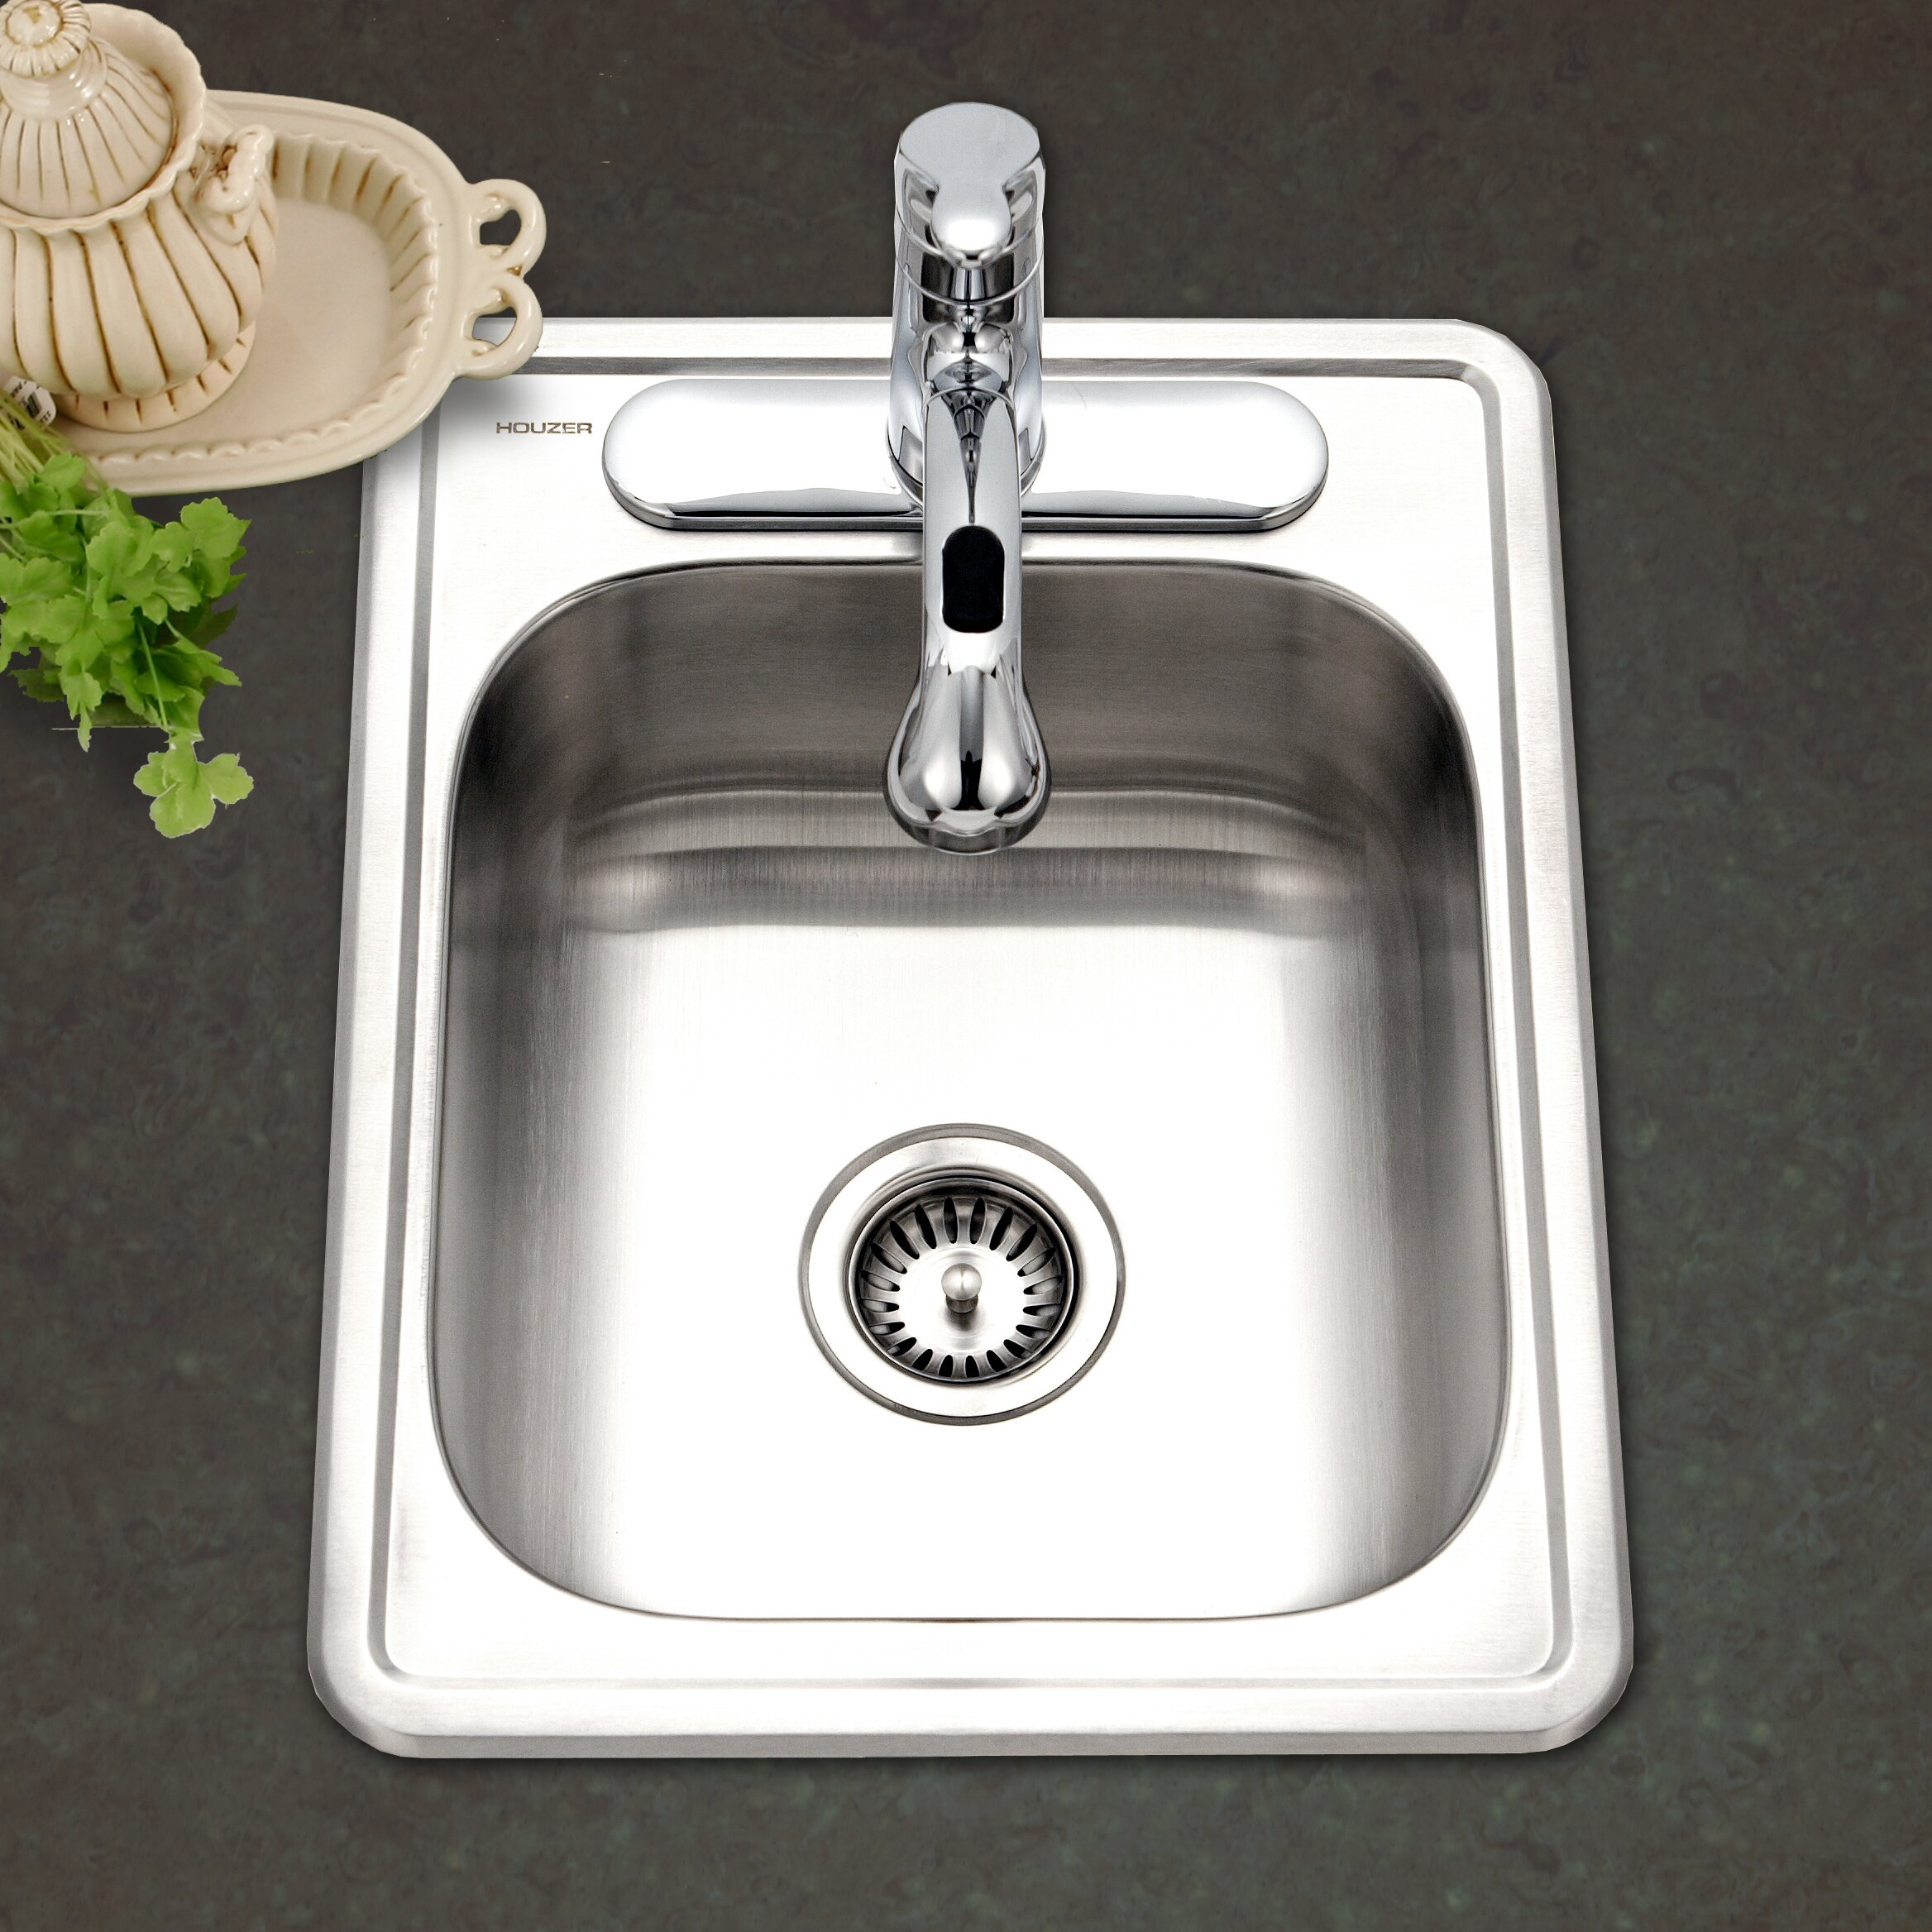 White apron sink ontario - Hospitality 22 X 17 Topmount 22 Gauge Large